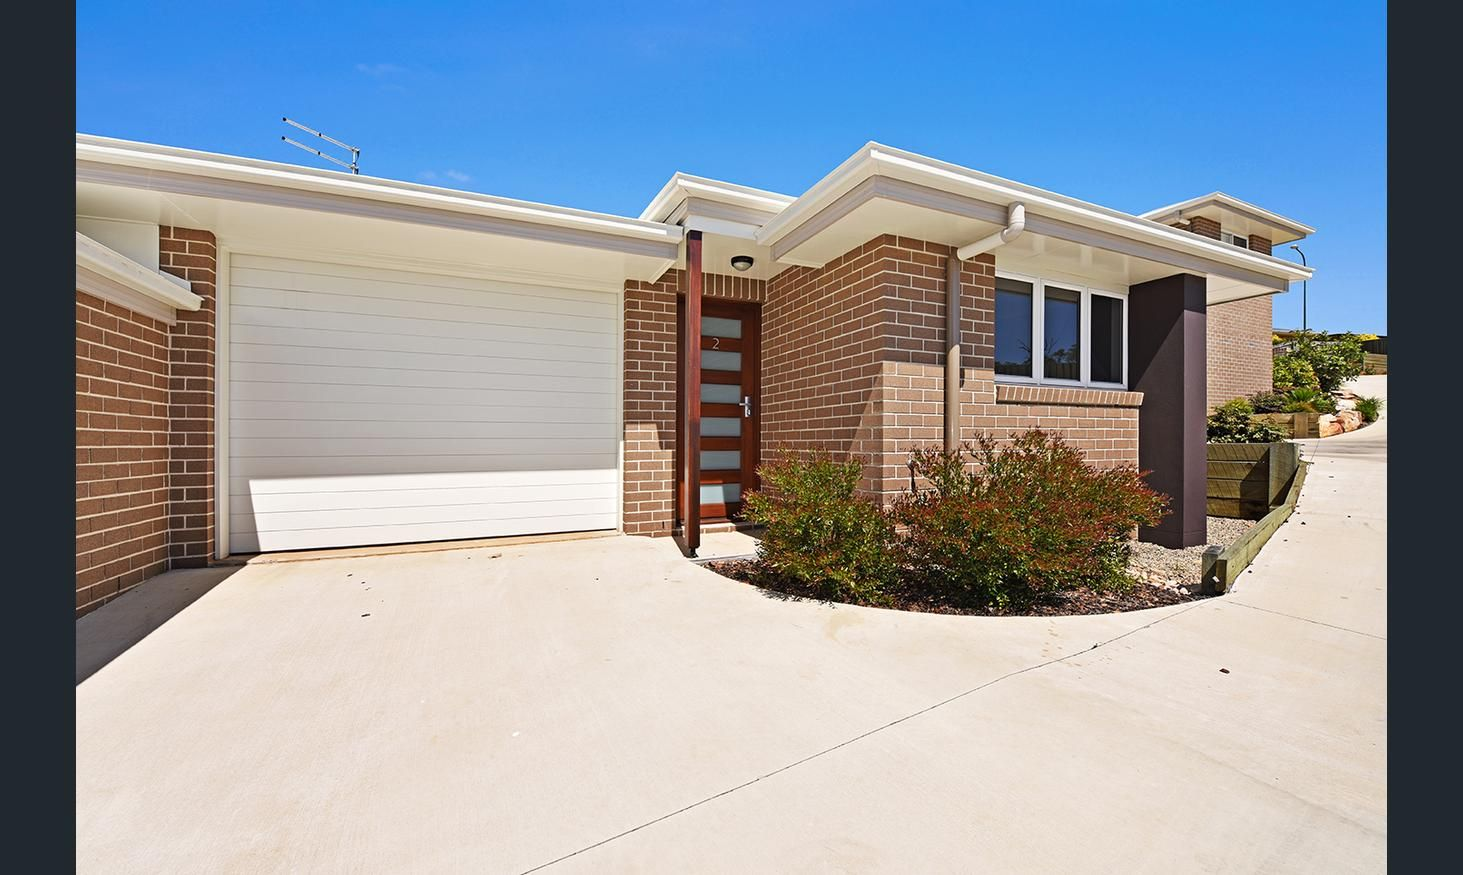 2/20 Camborne Street, Kleinton QLD 4352, Image 0